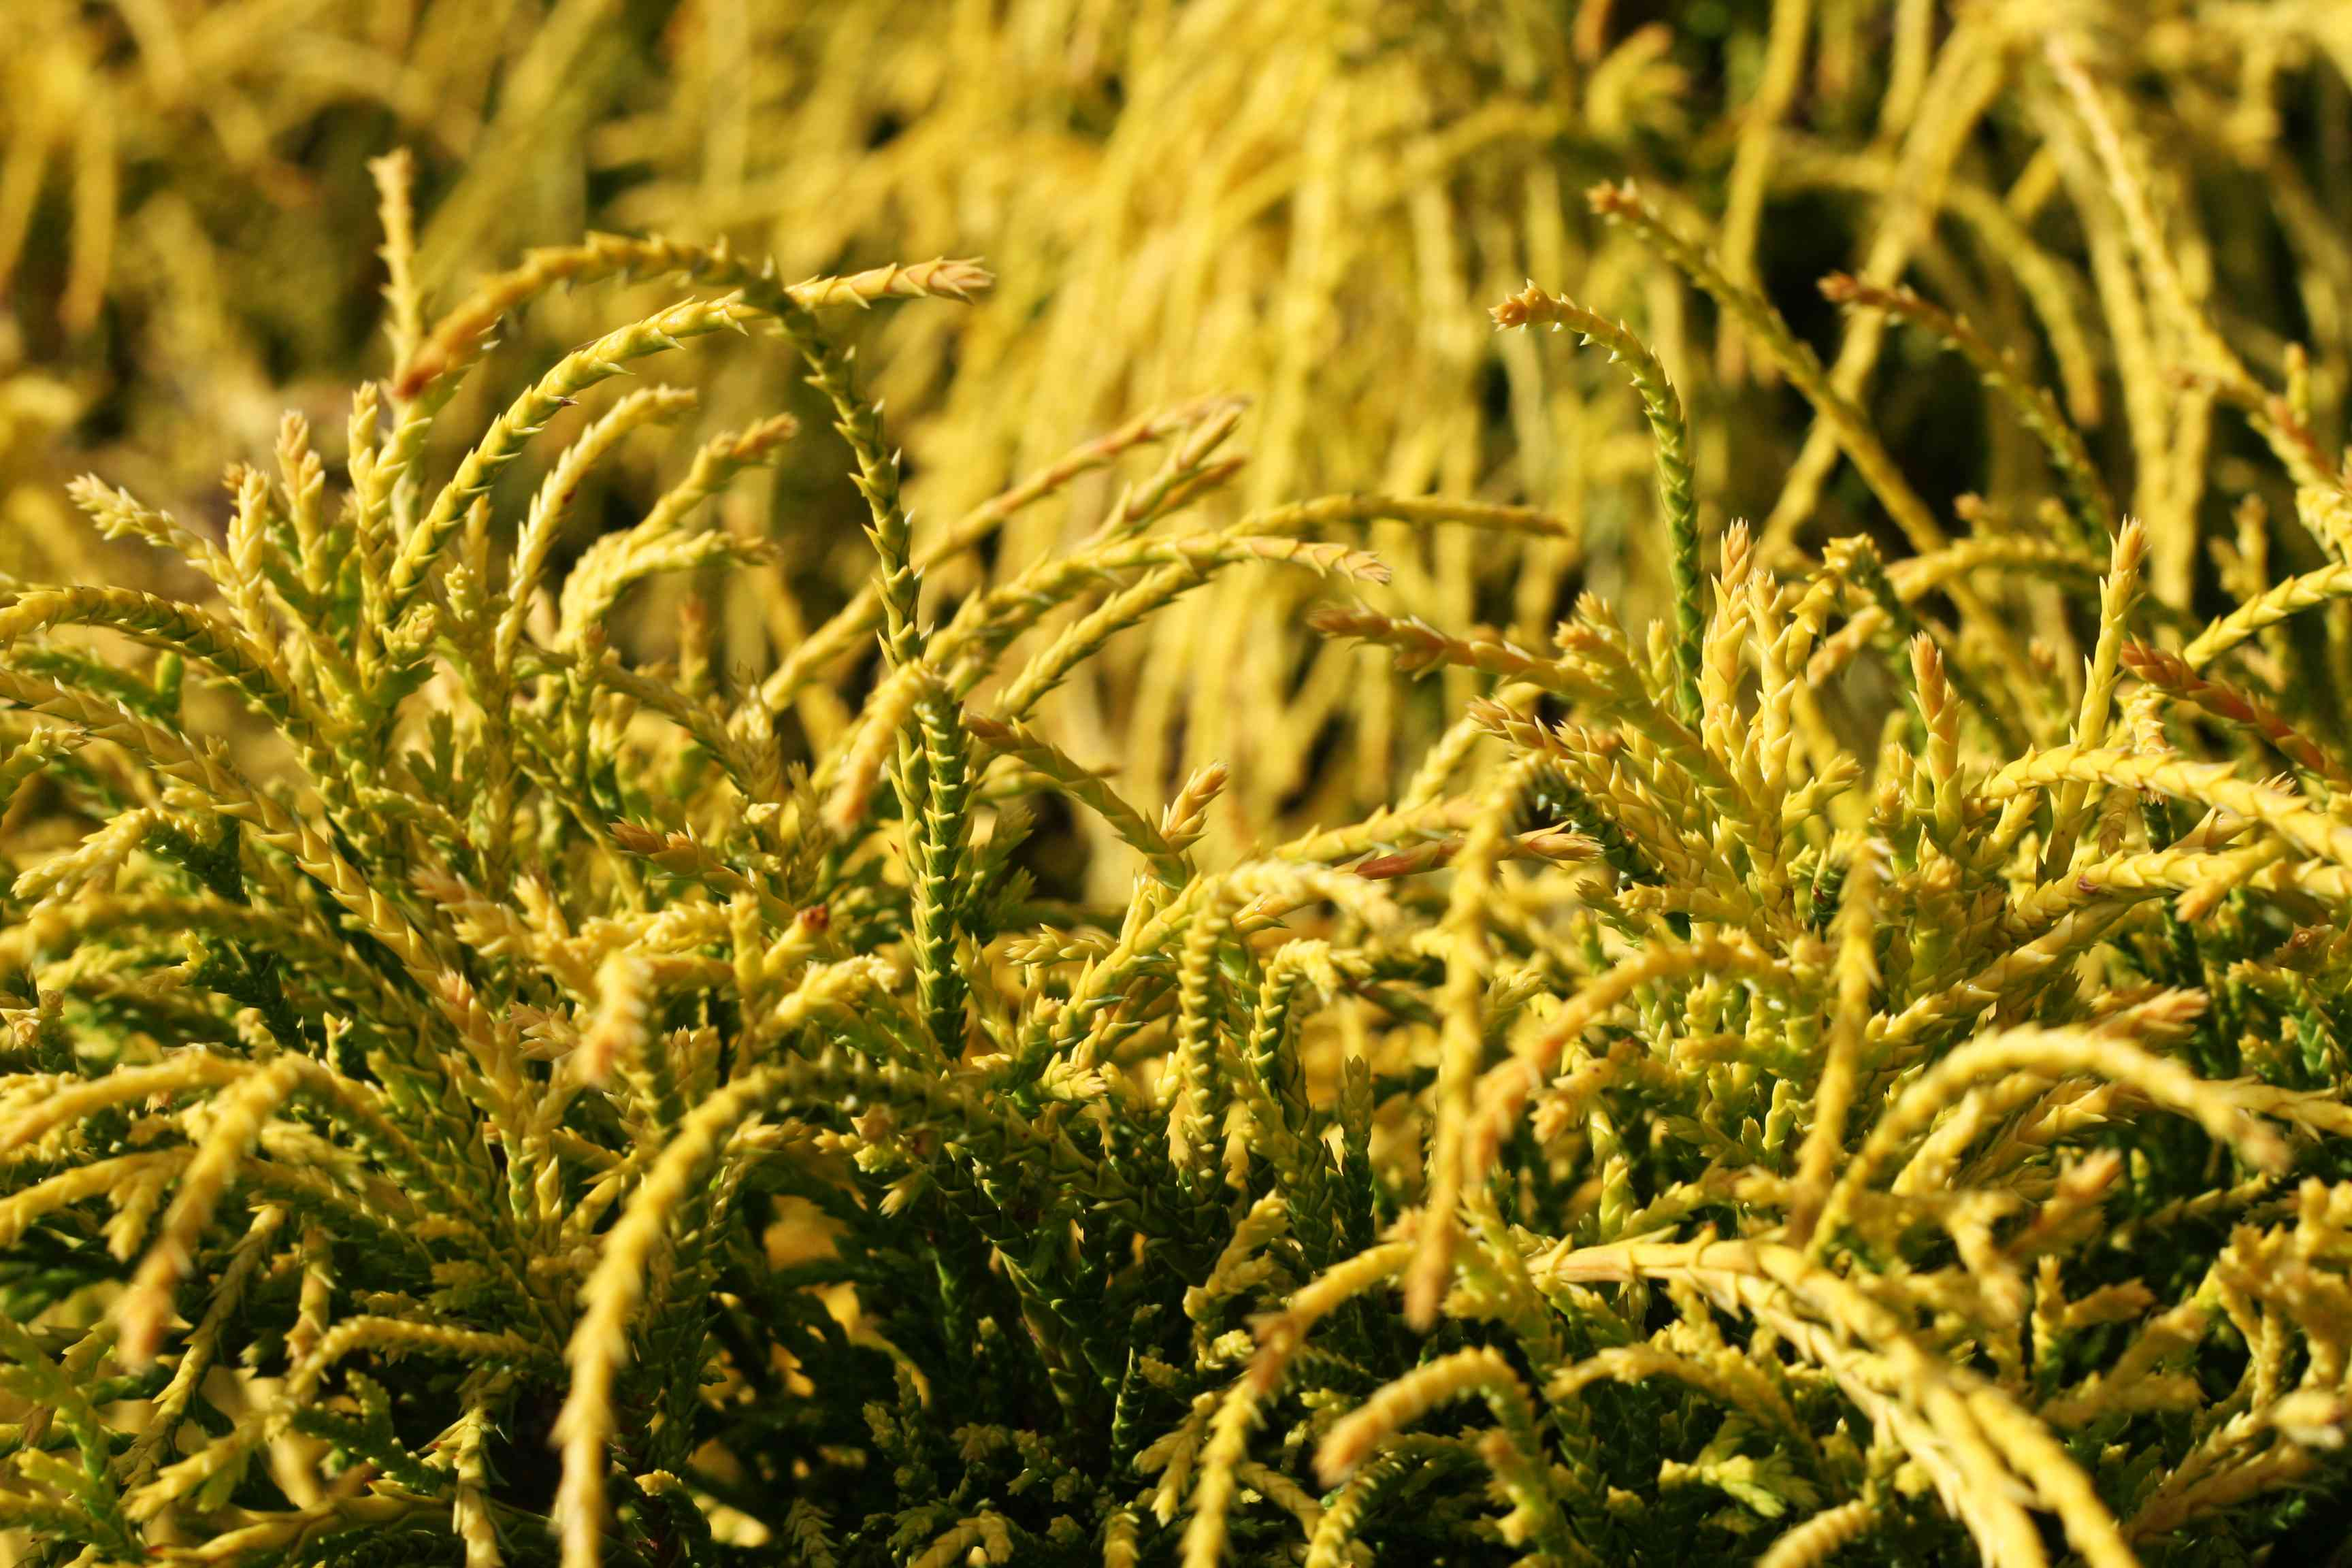 Closeup of foliage of Gold Mops cypress